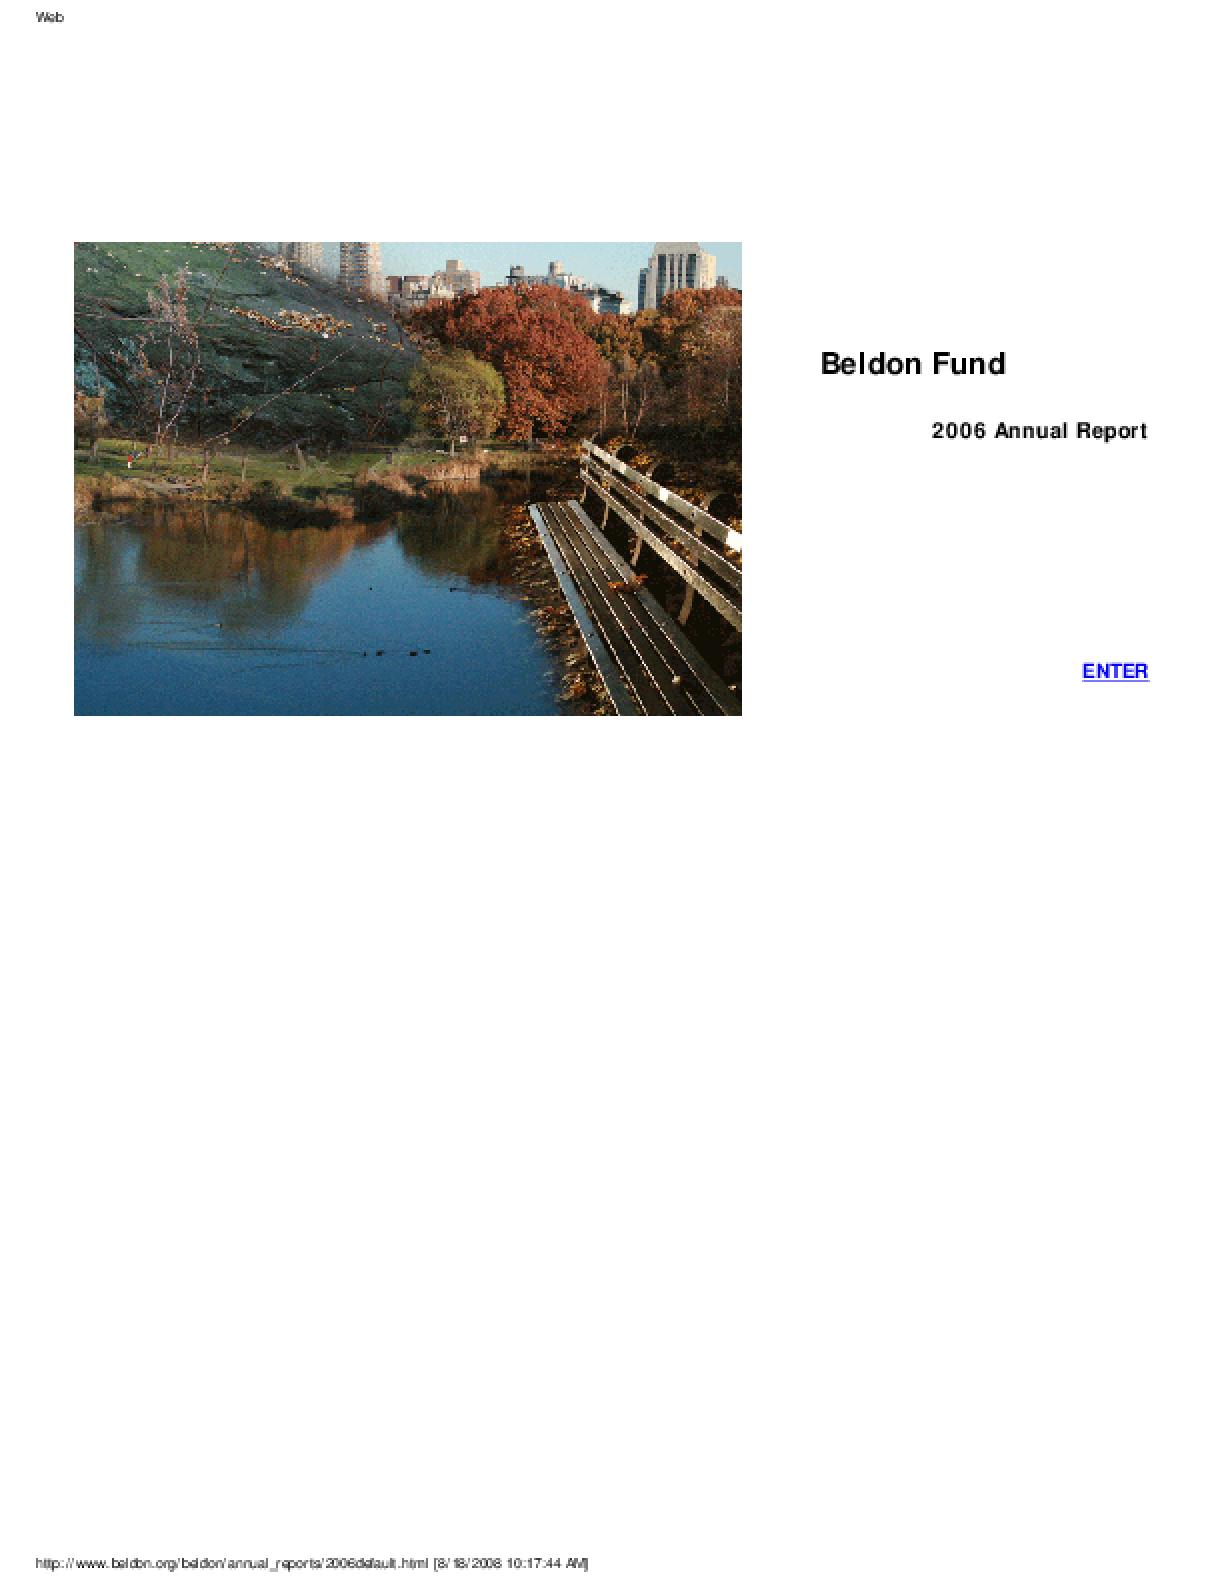 Beldon Fund - 2006 Annual Report